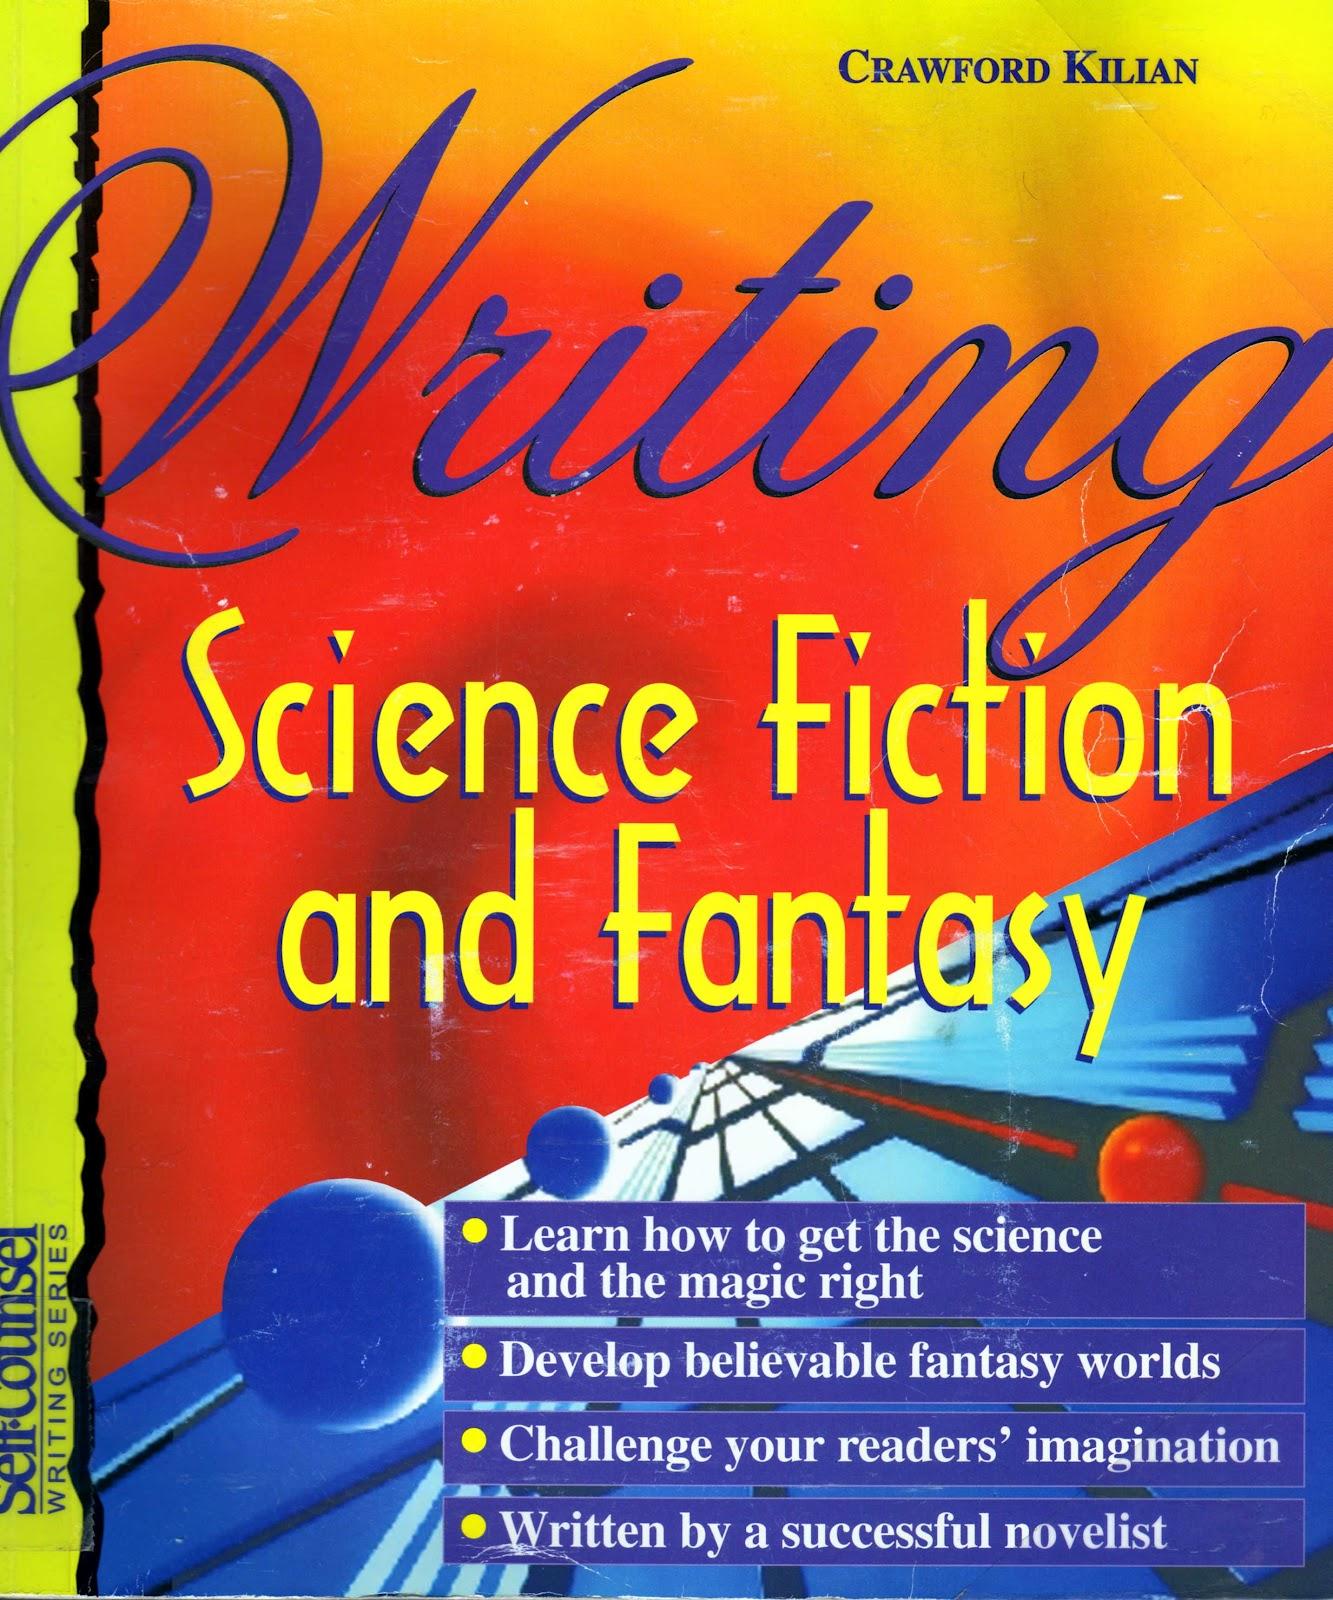 Science fiction essay